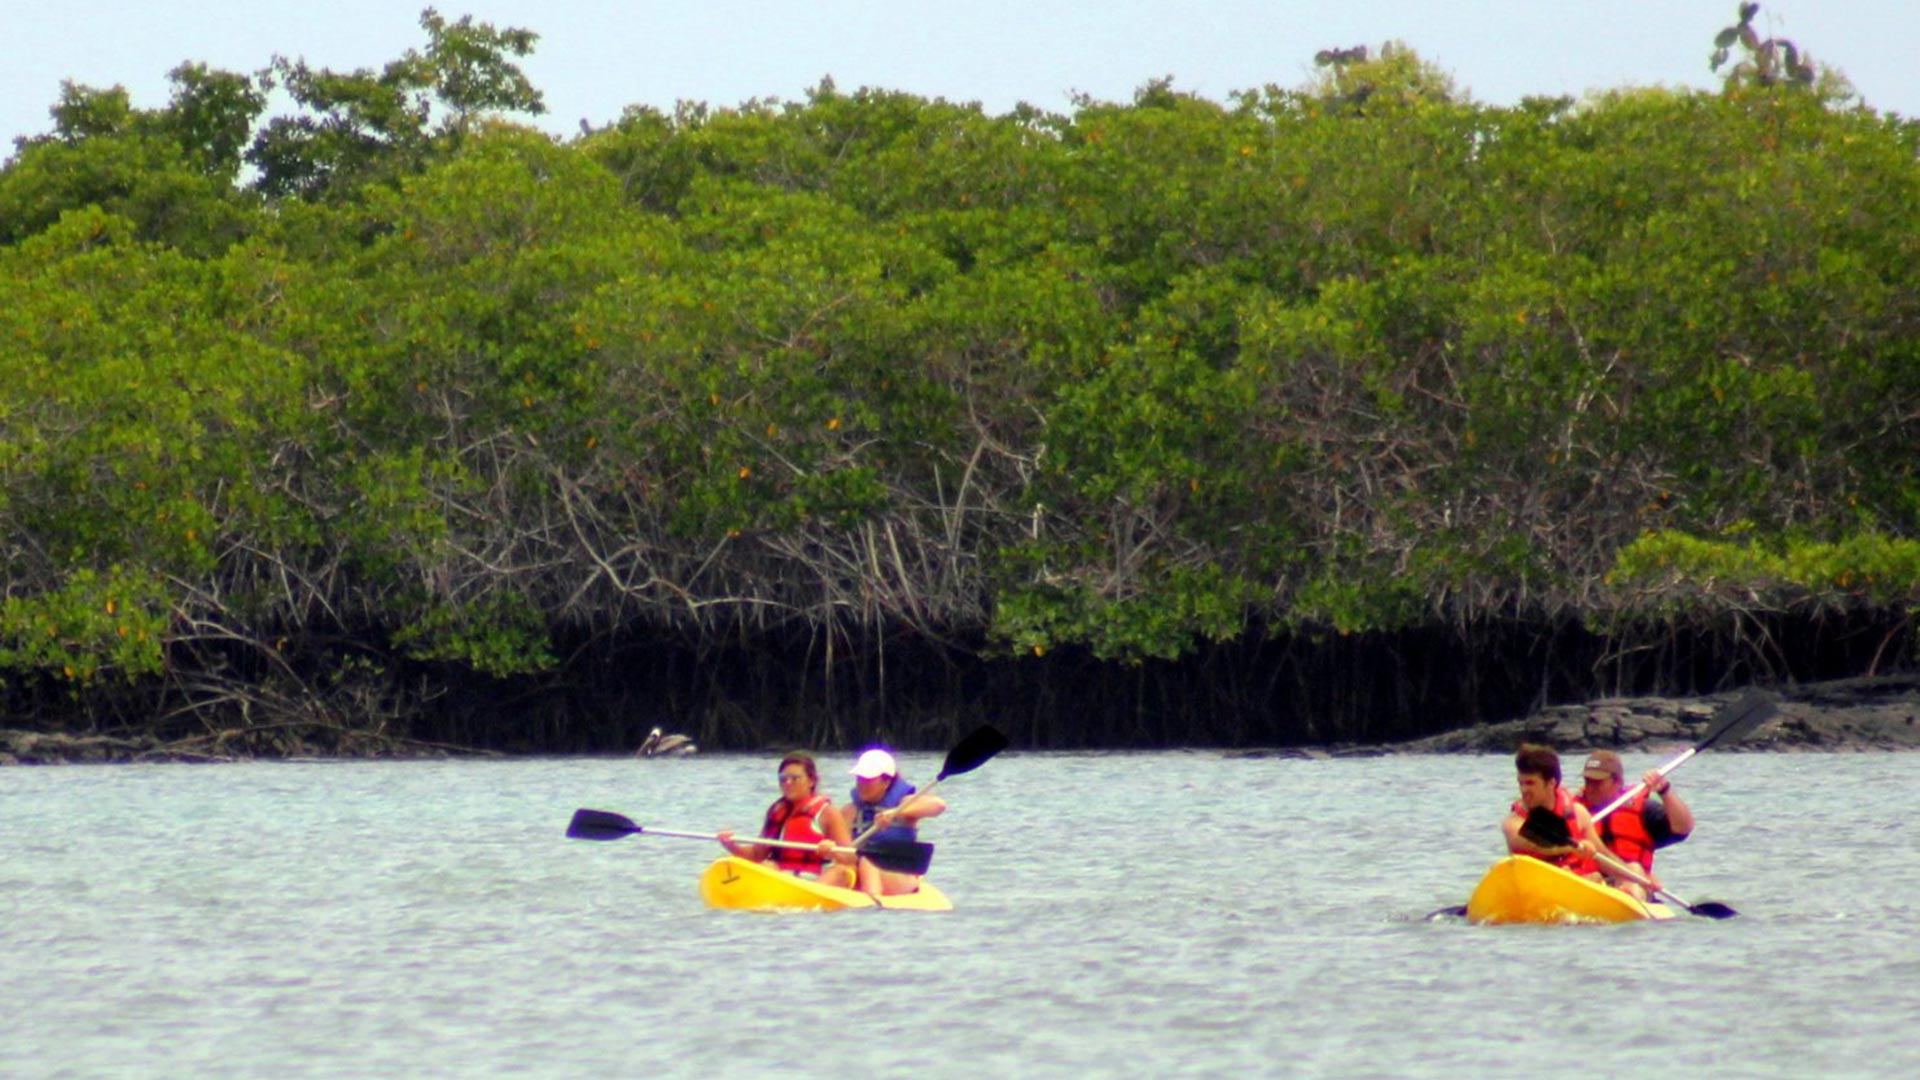 Kayaking in the Galapagos Islands